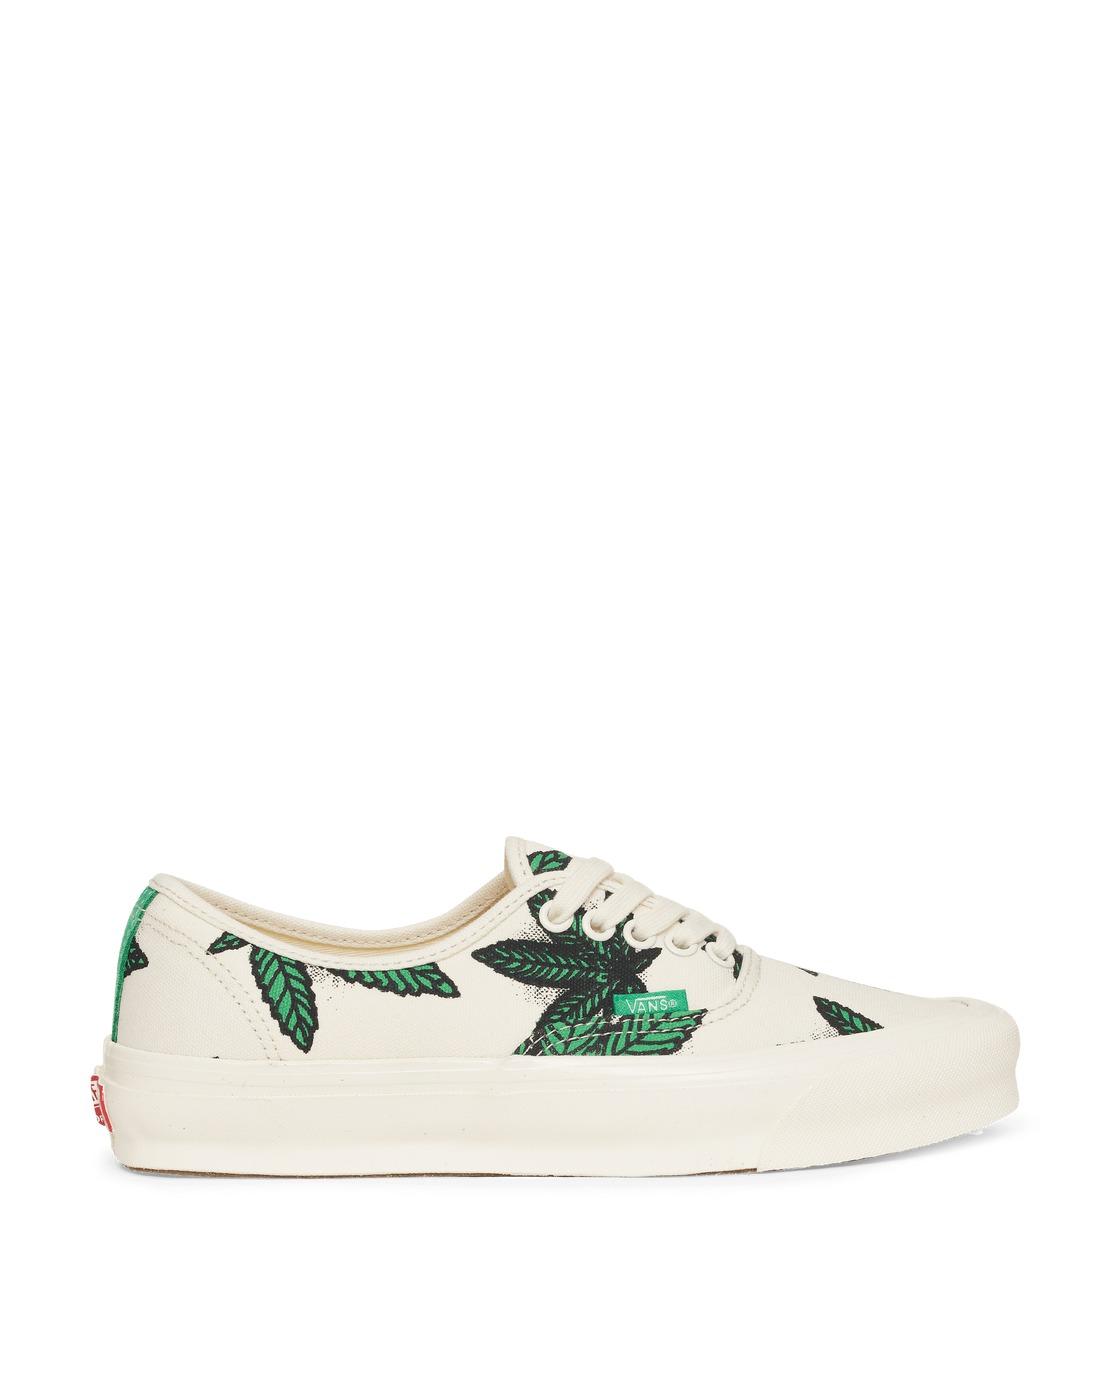 Photo: Vans Sweet Leaf Og Authentic Lx Sneakers Green